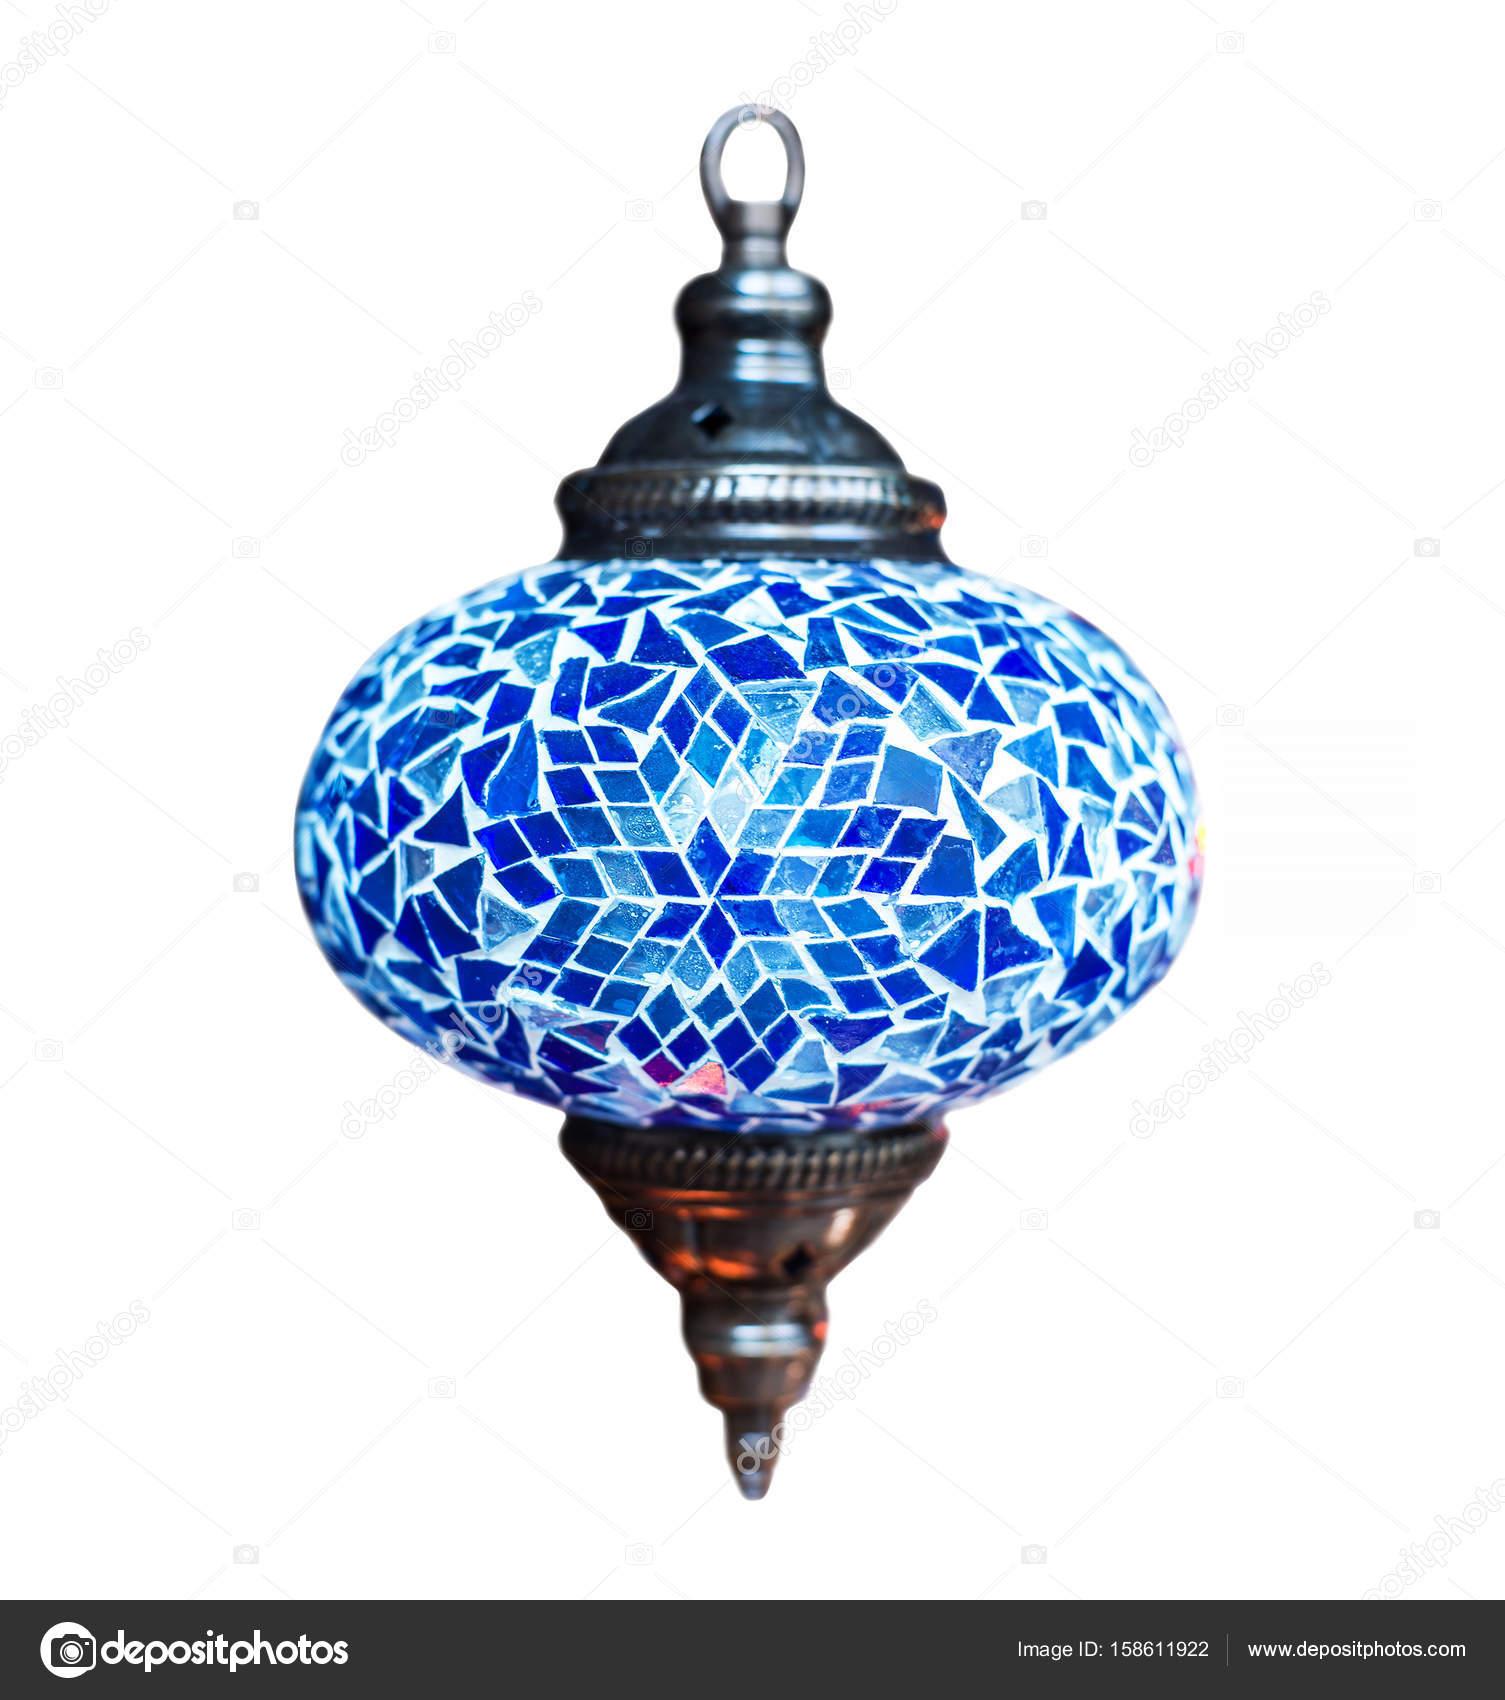 arabic lantern lamp — Stock Photo © GekaSkr #158611922 for Traditional Arabic Lamp  150ifm